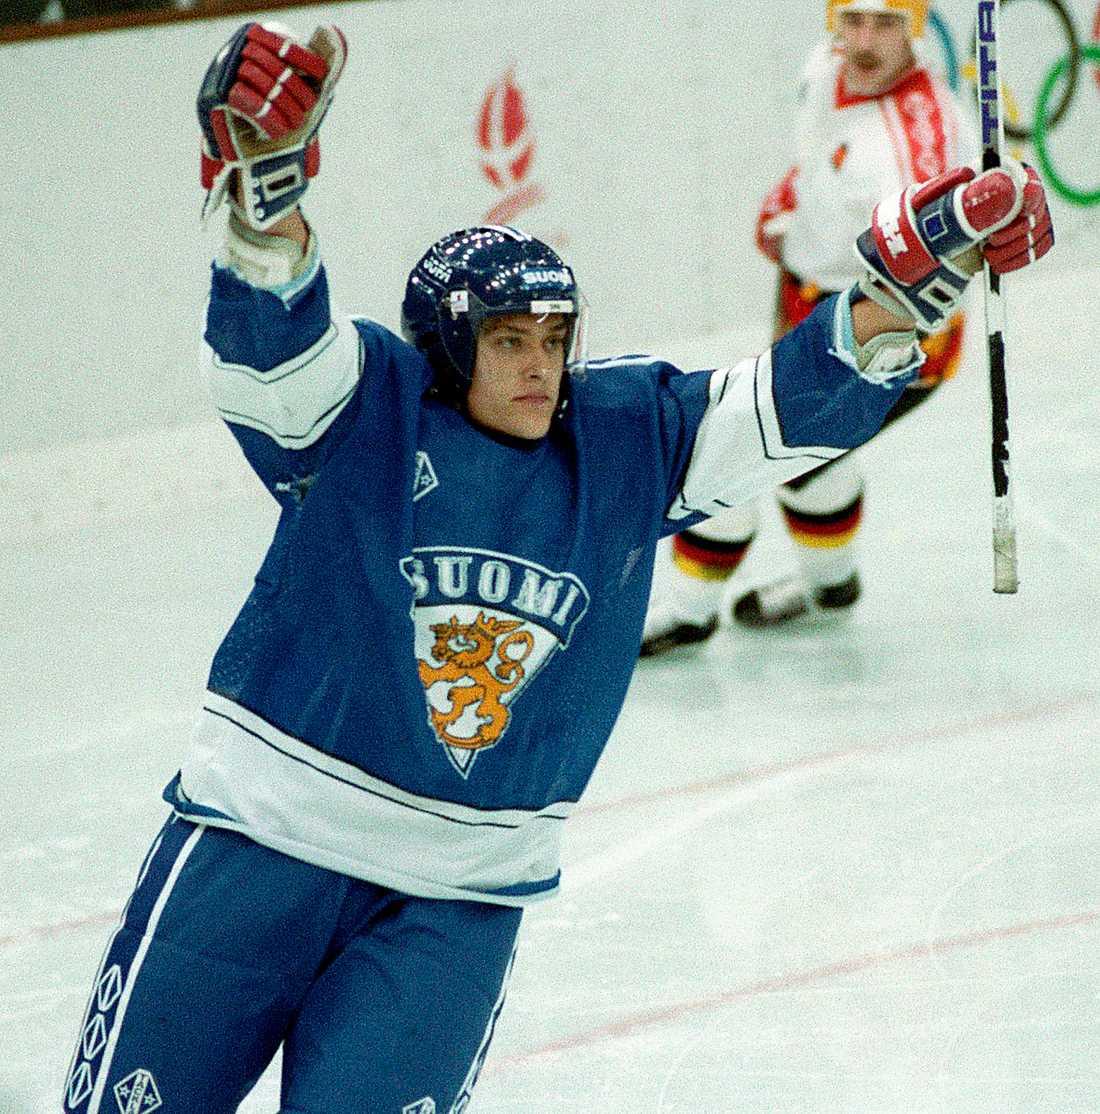 Selänne i OS 1992, ALBERTVILLE 8 matcher, 7 mål + 4 assist = 11 poäng. Finlands placering: SJUA